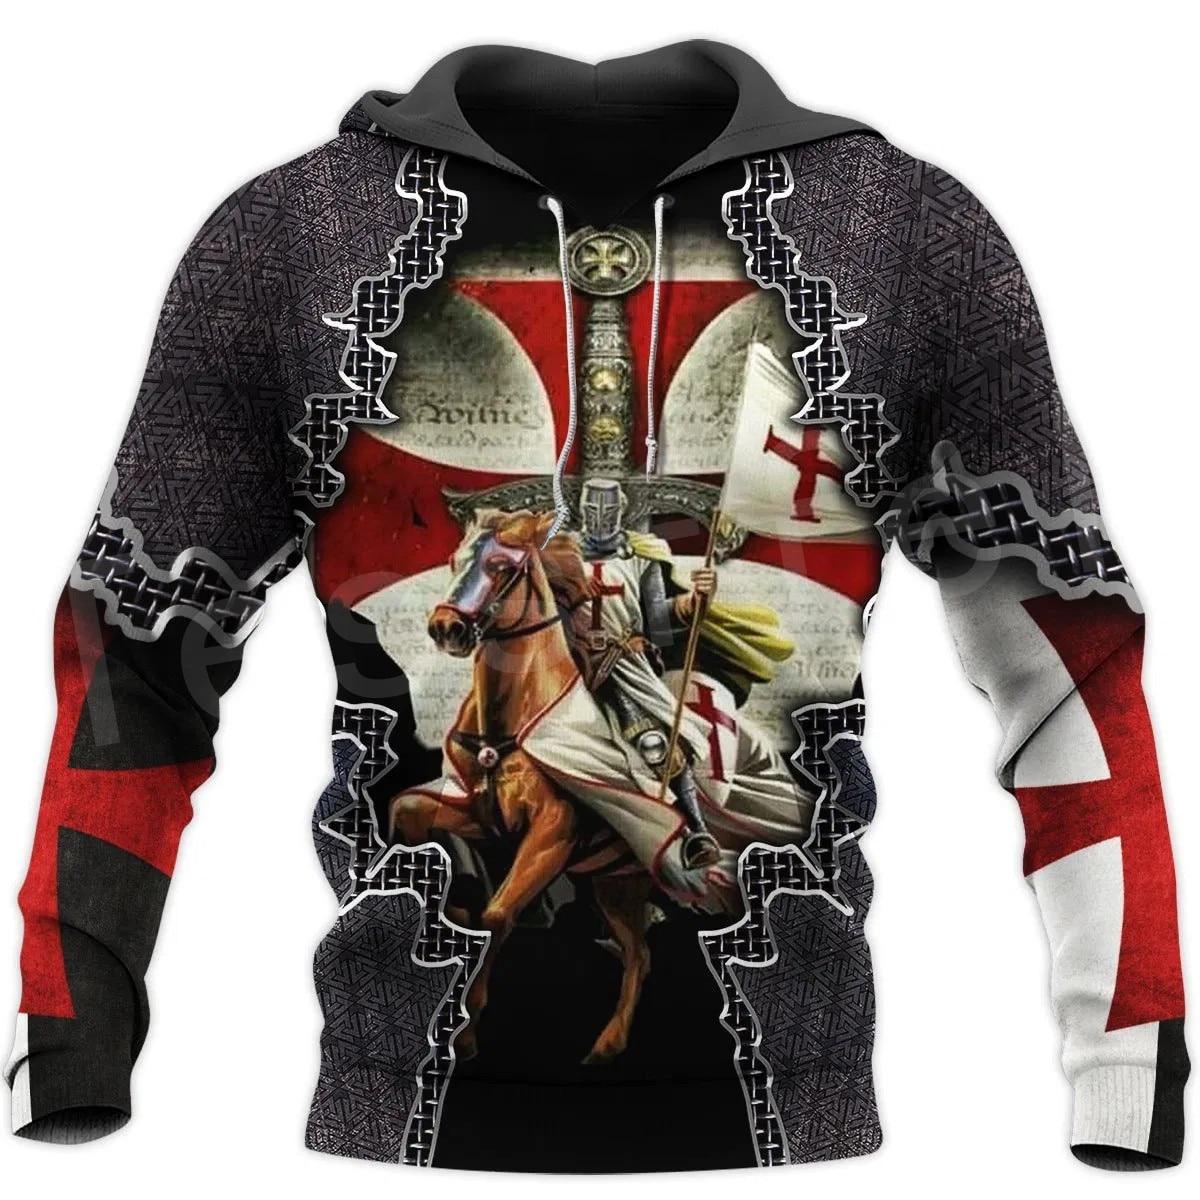 Tessffel Knight Templar Costume Armor Pullover NewFashion Harajuku Streetwear 3DPrint Unisex Zipper/Hoodies/Sweatshirt/Jacket 14